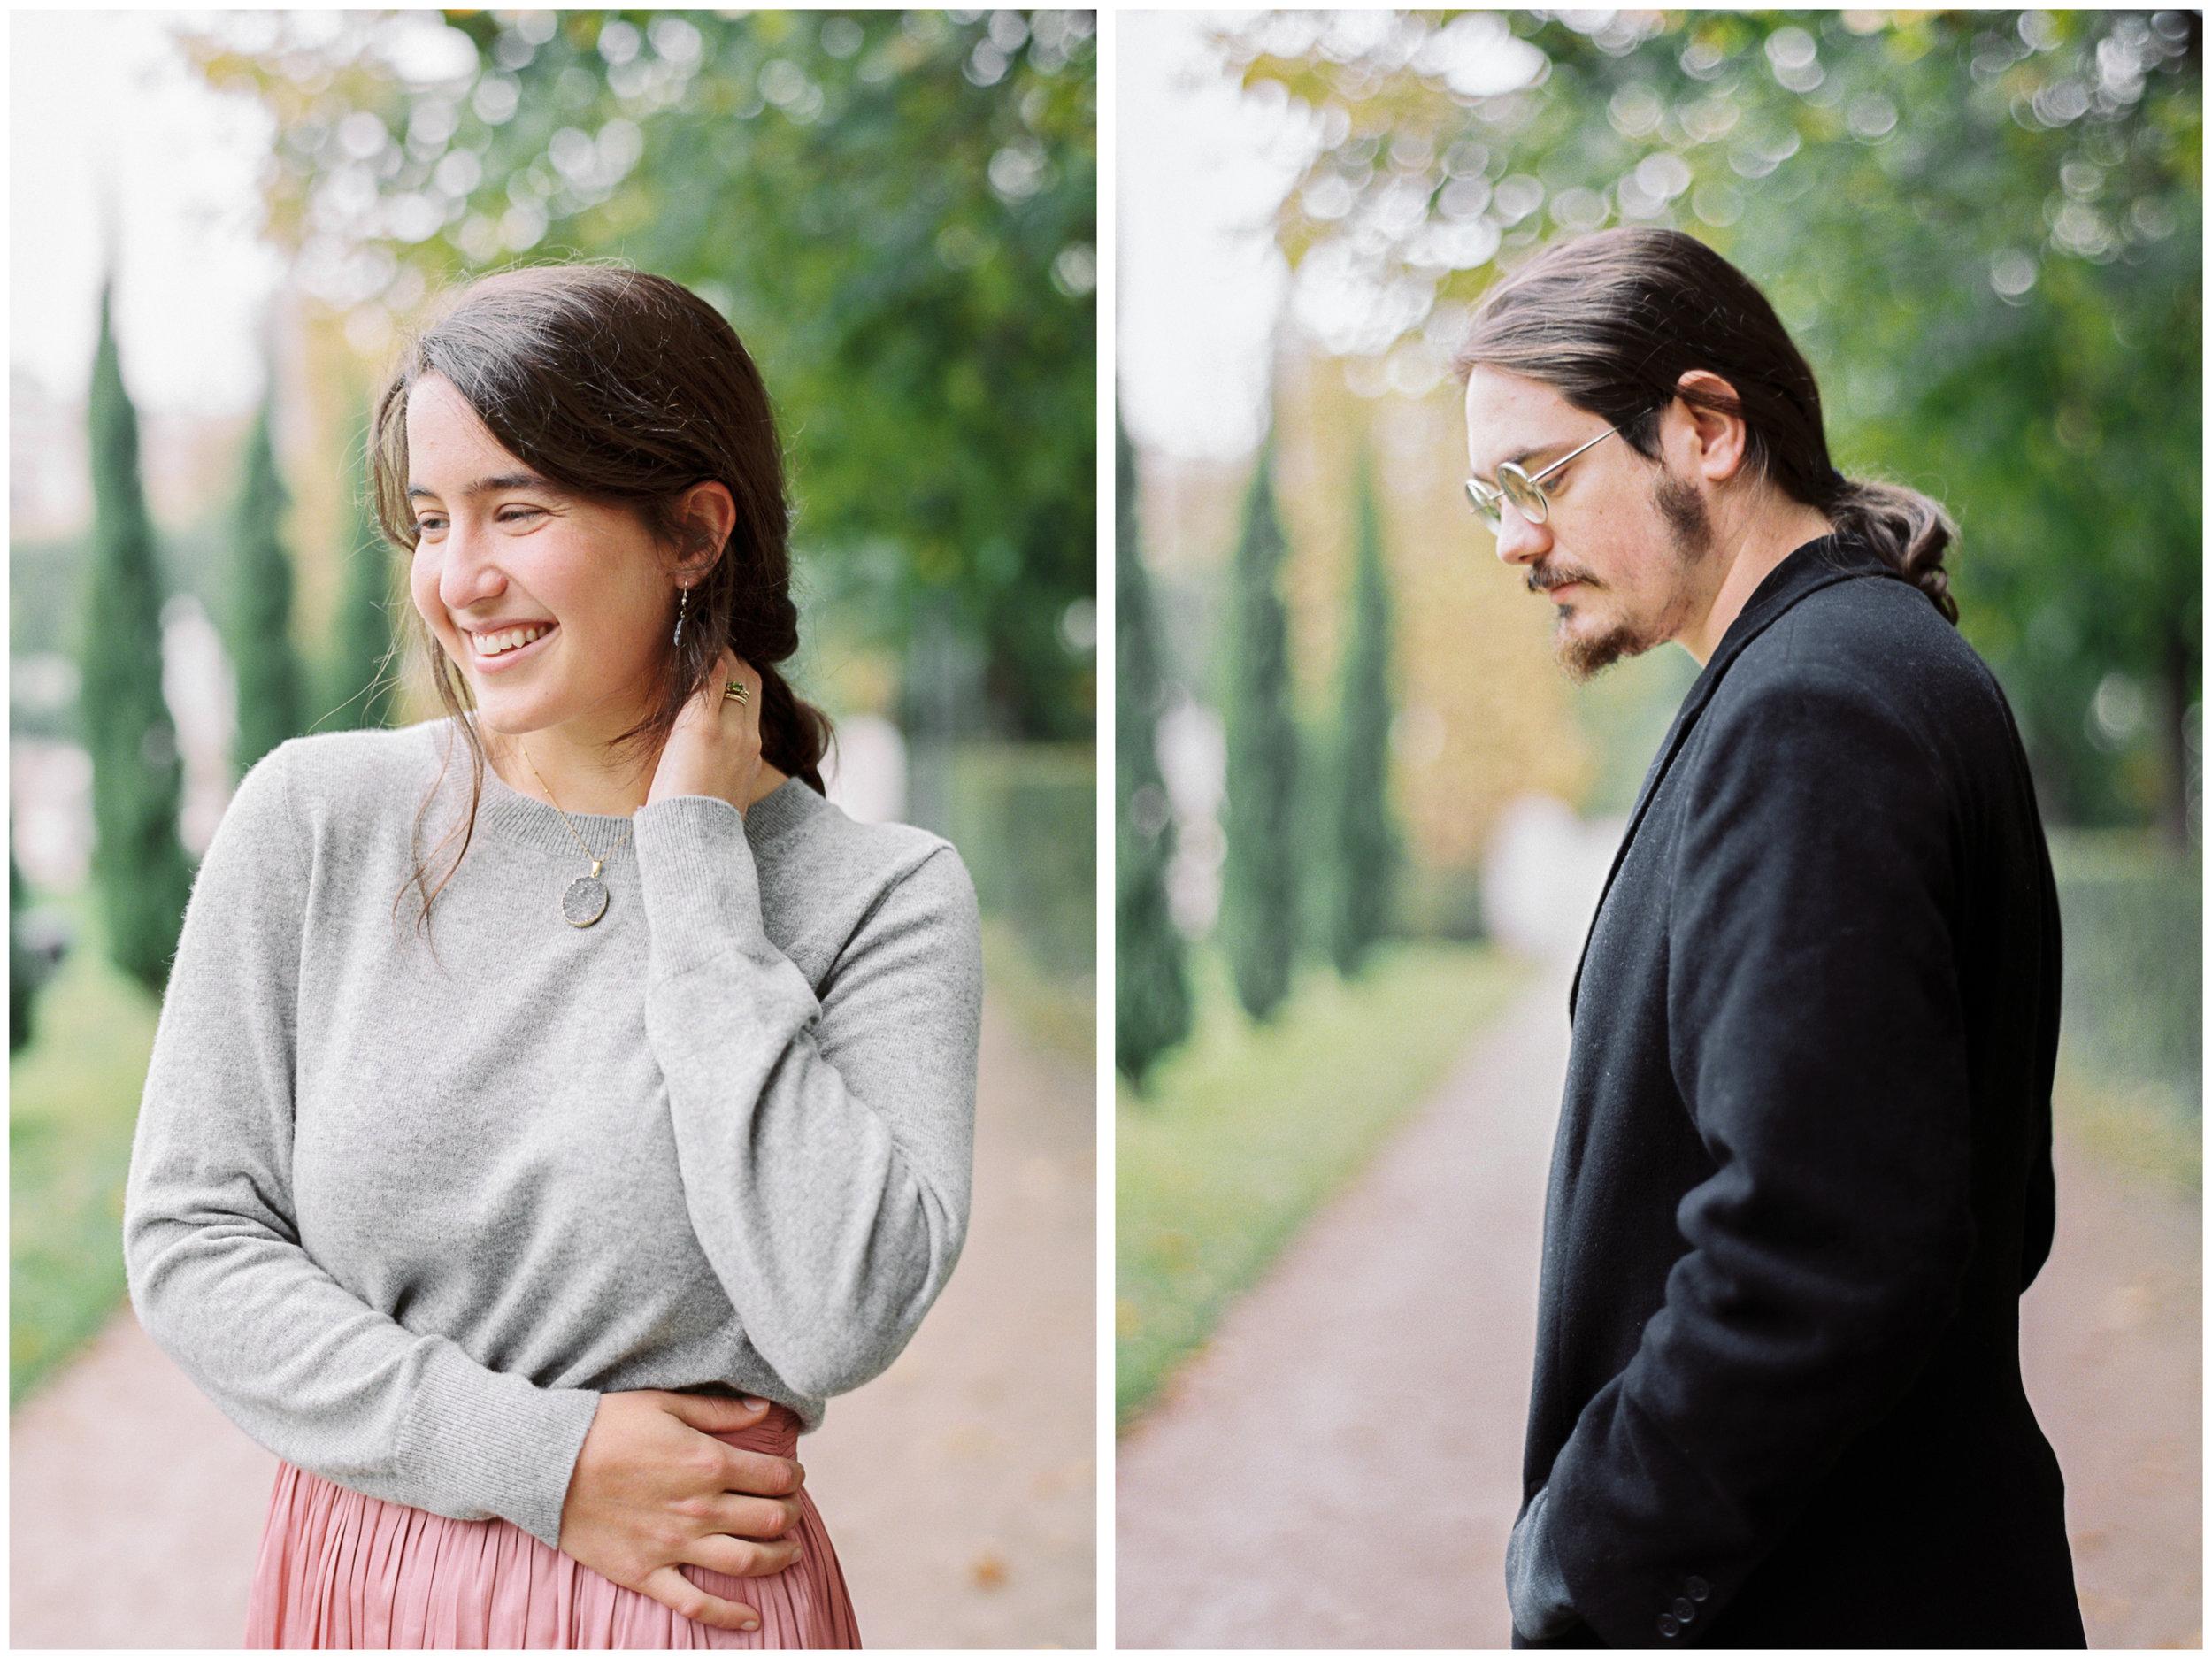 Vienna Portraits | Vienna, Austria | Fuji400H | Contax645 | Vienna Film Photographer | Michelle Mock Photography